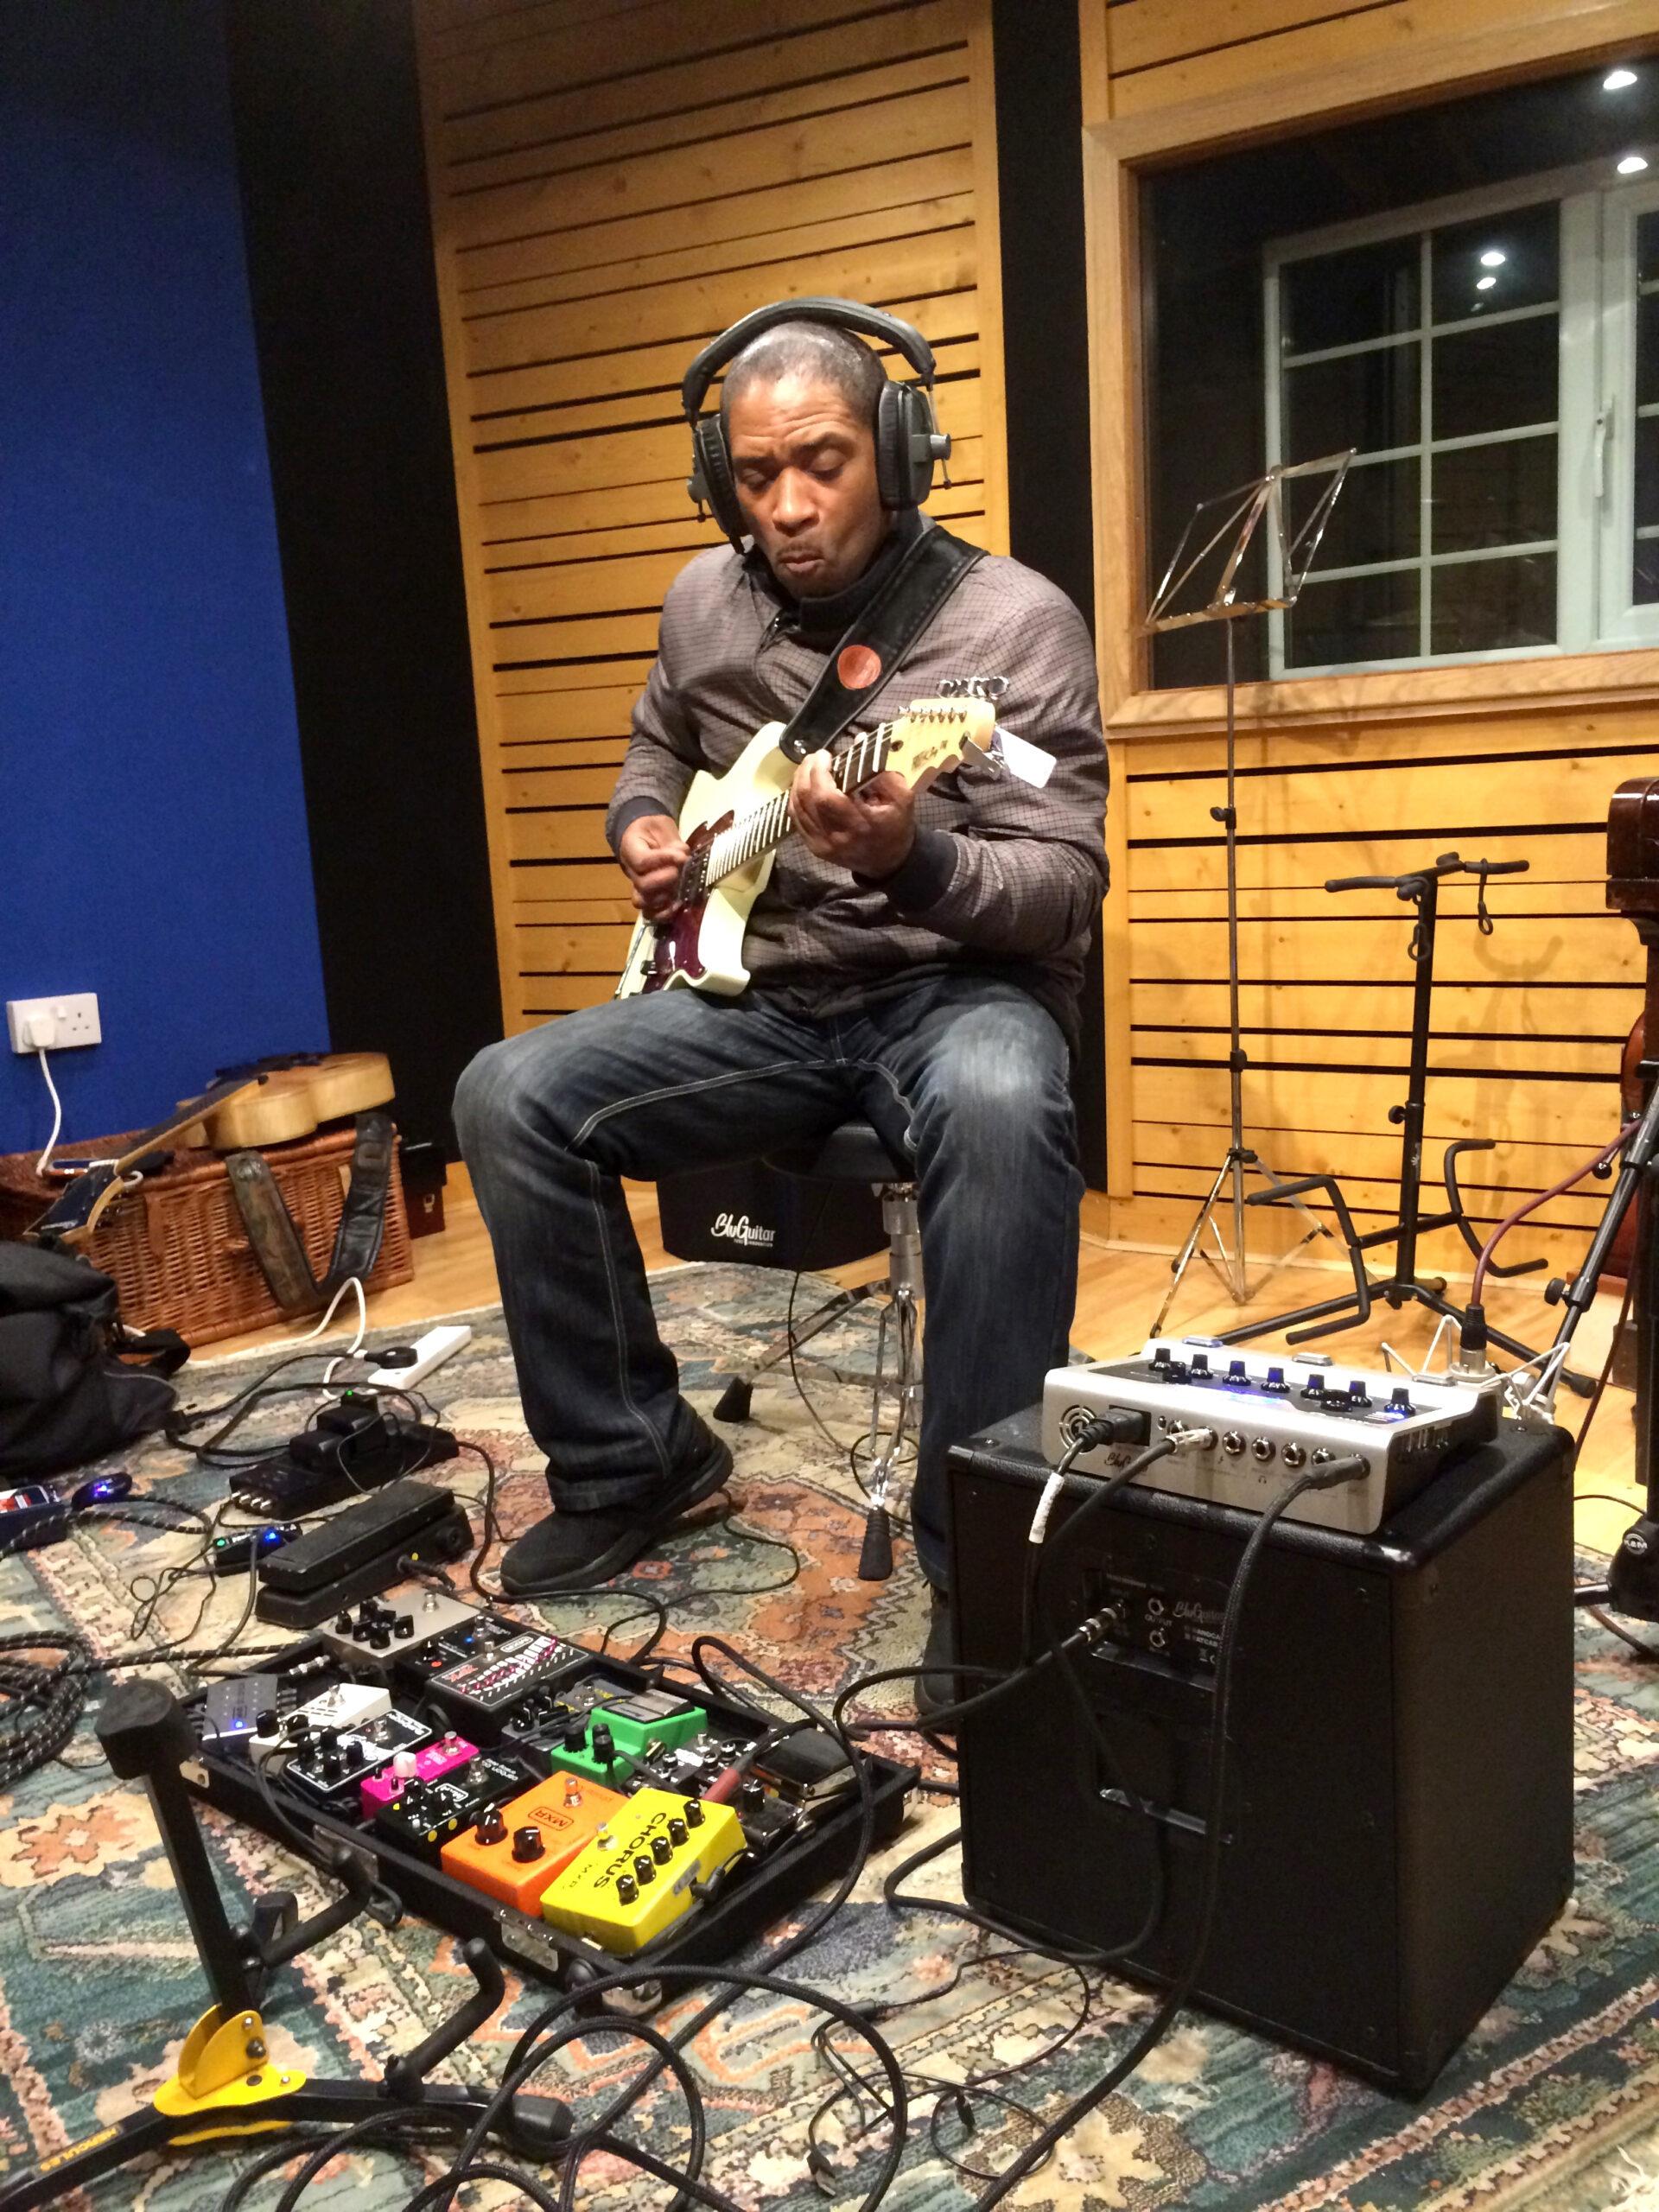 Slipway-Studio_Electric-Guitar_Recording_04